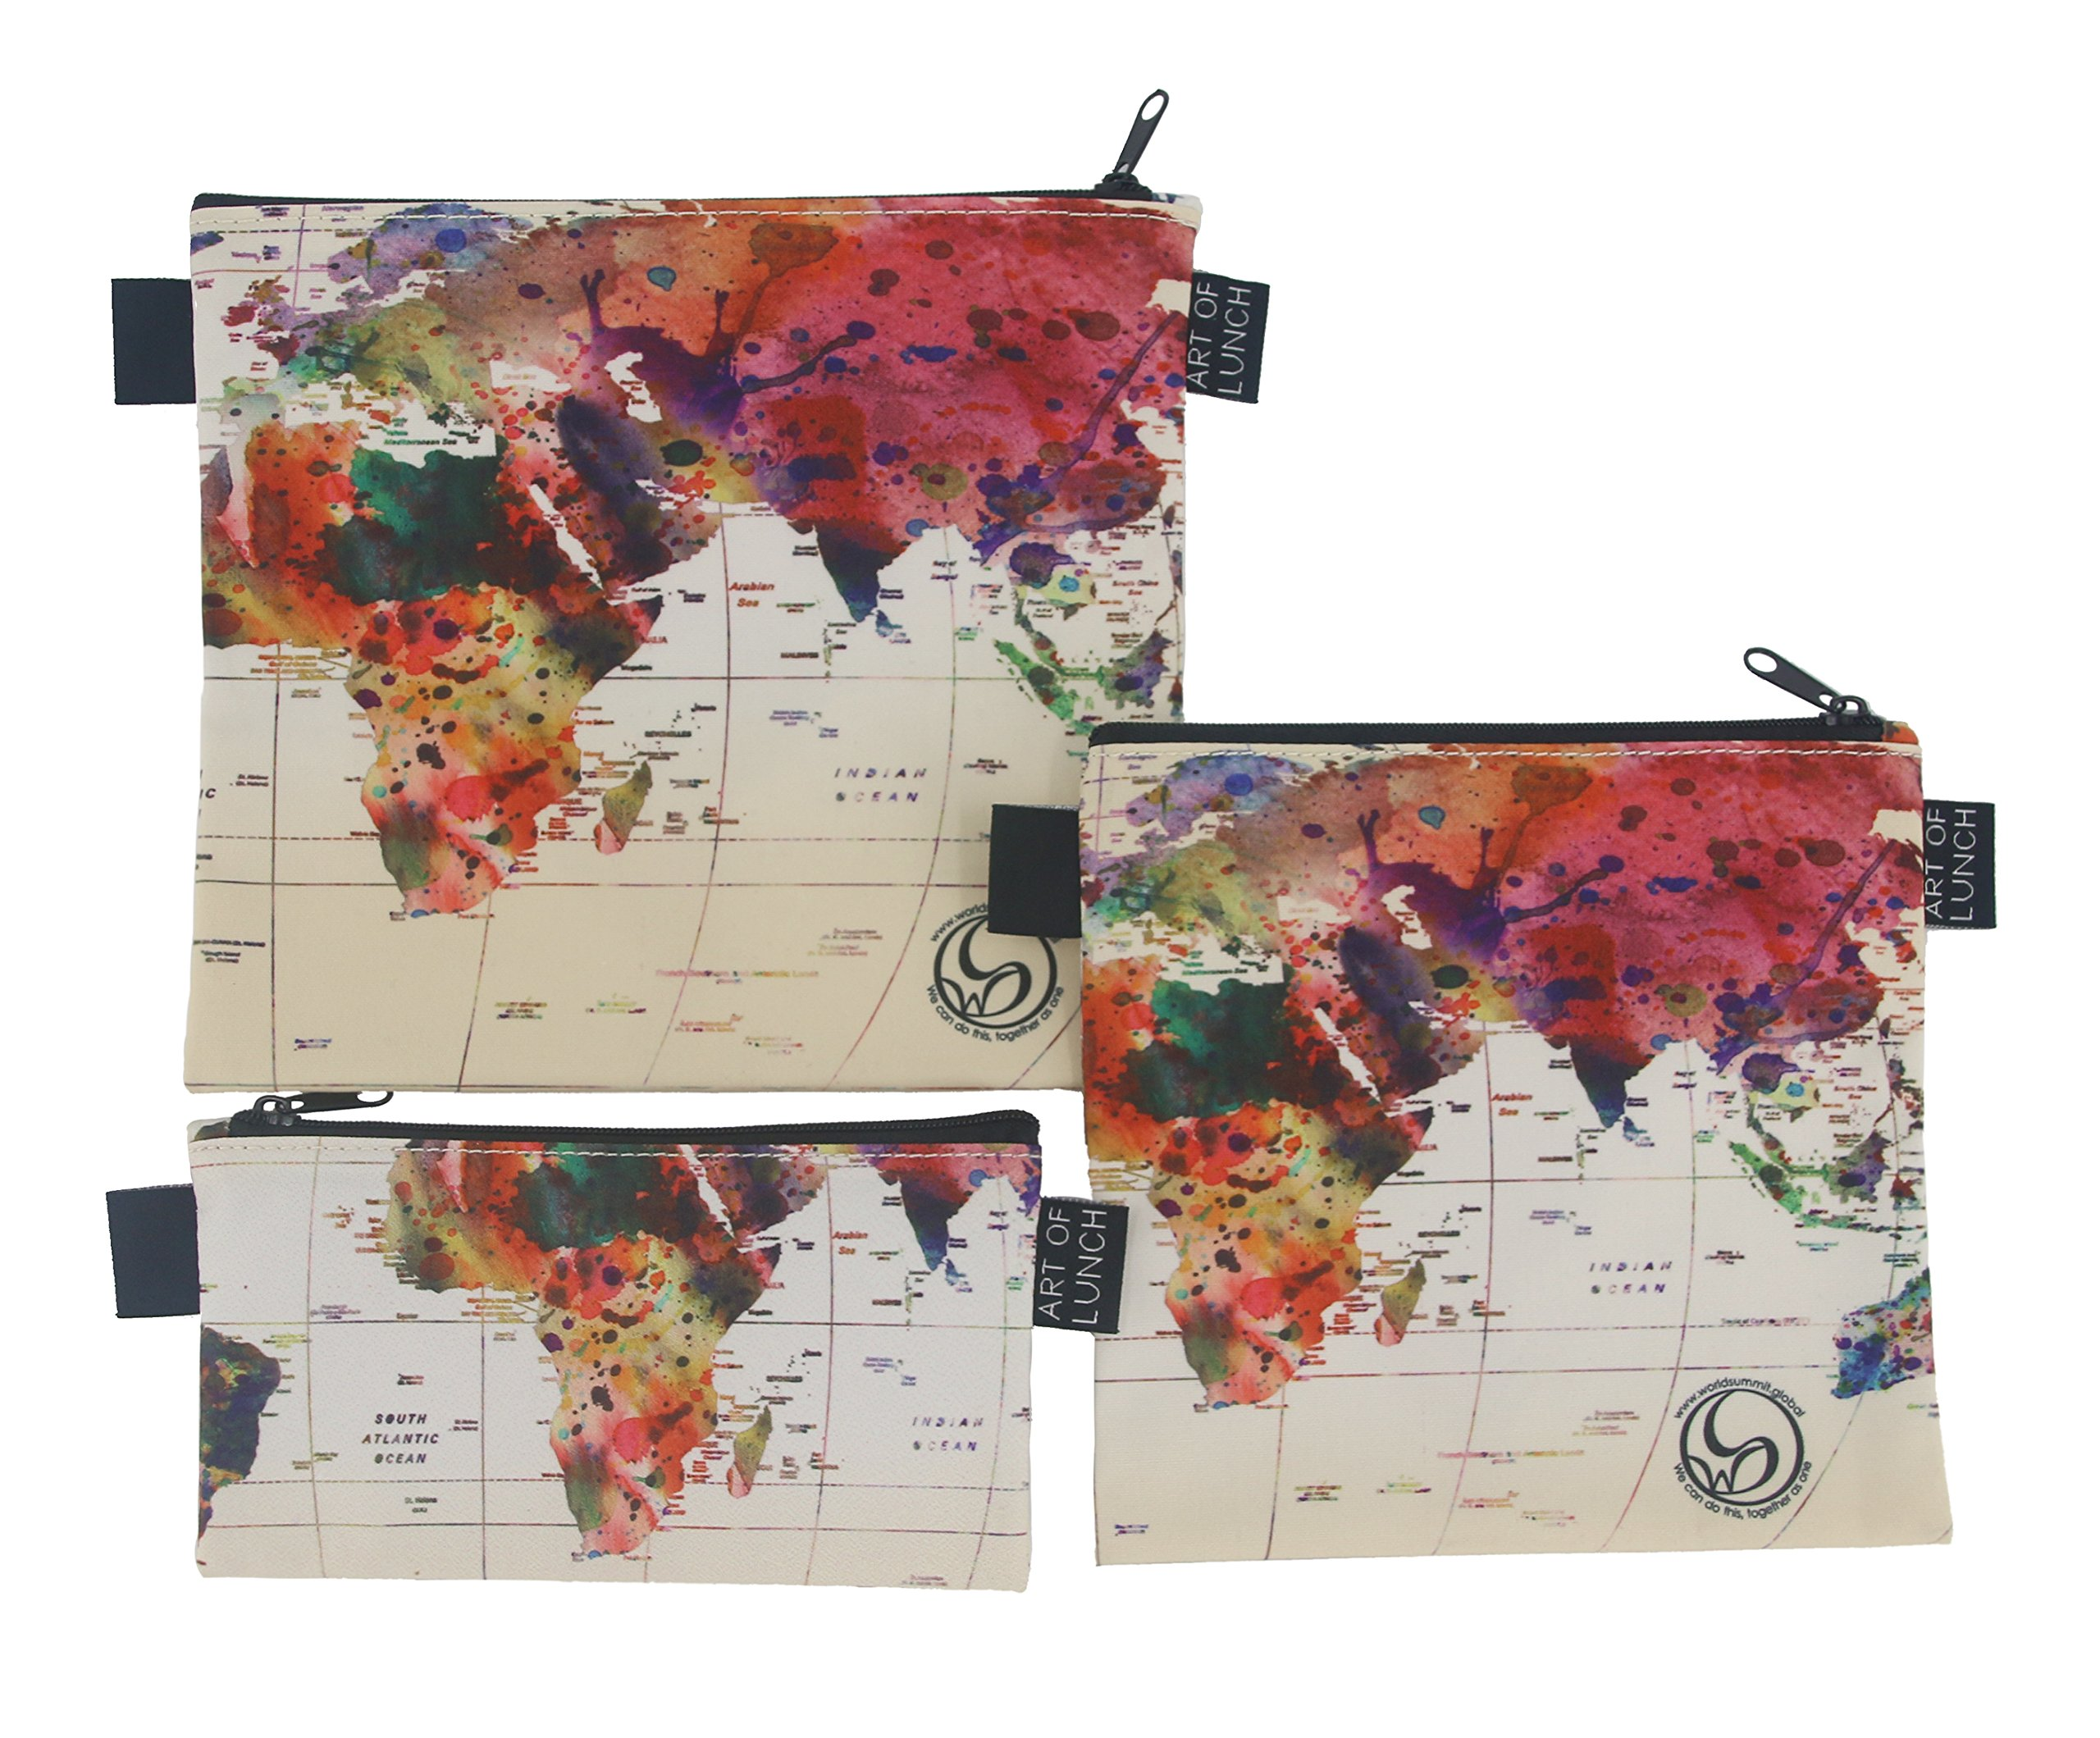 Designer Lunch Bags for Men & Women, Boys & Girls, Fashionable, Reusable, Snack & Sandwich Bags w Zipper - Design by Mark Ashkenazi (Israel) - World Map